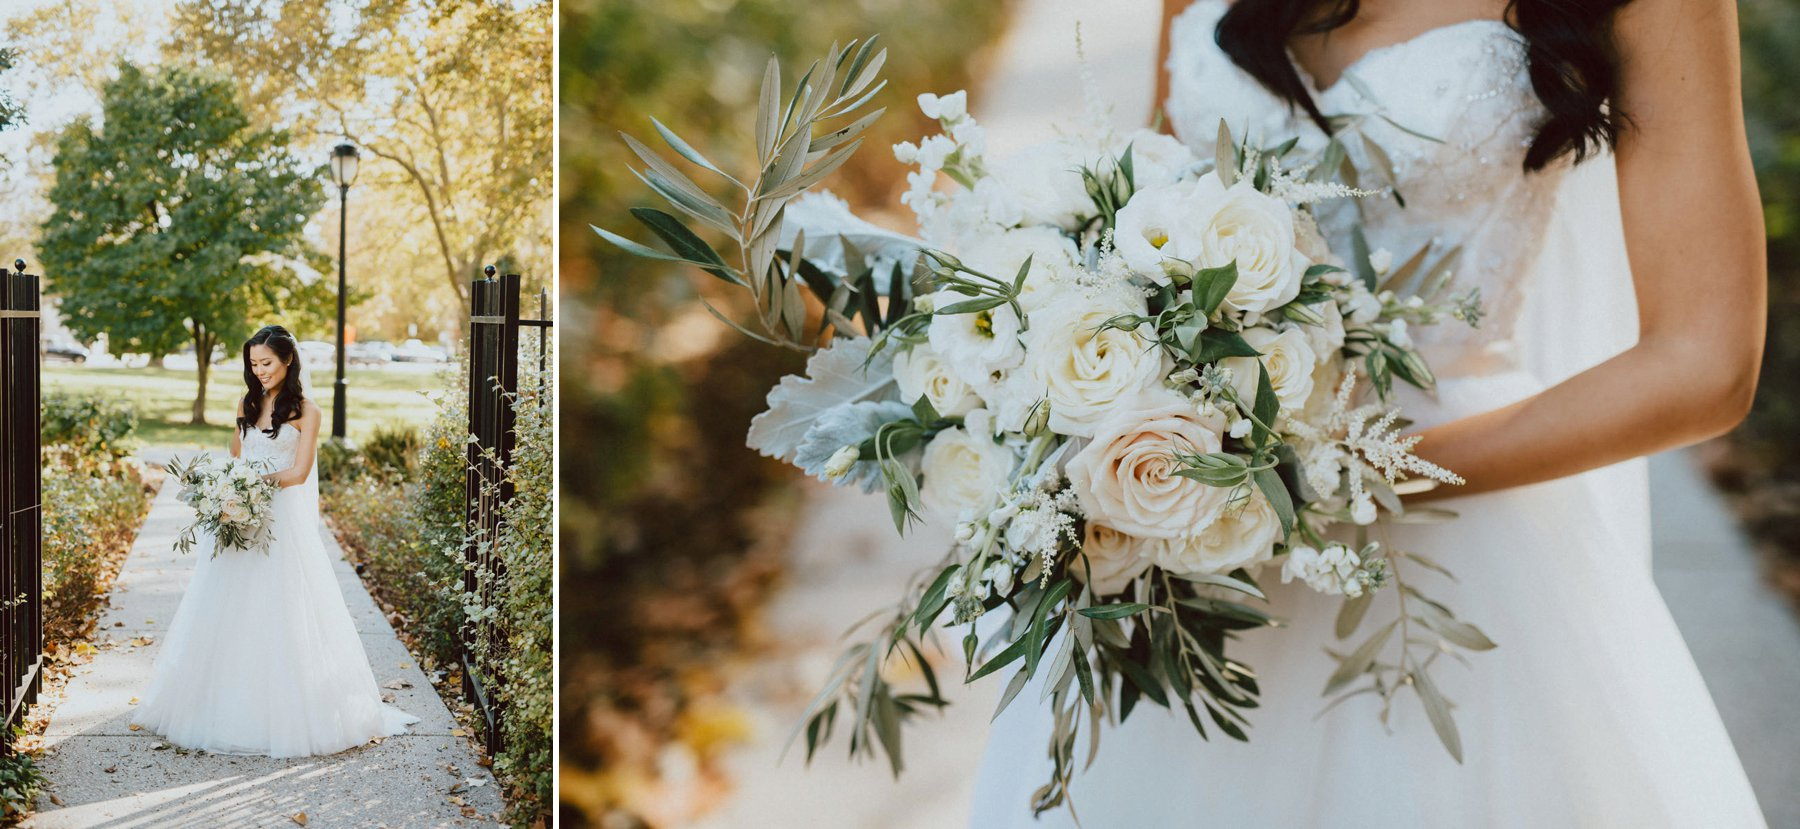 philadelphia-wedding-photographer-45.jpg